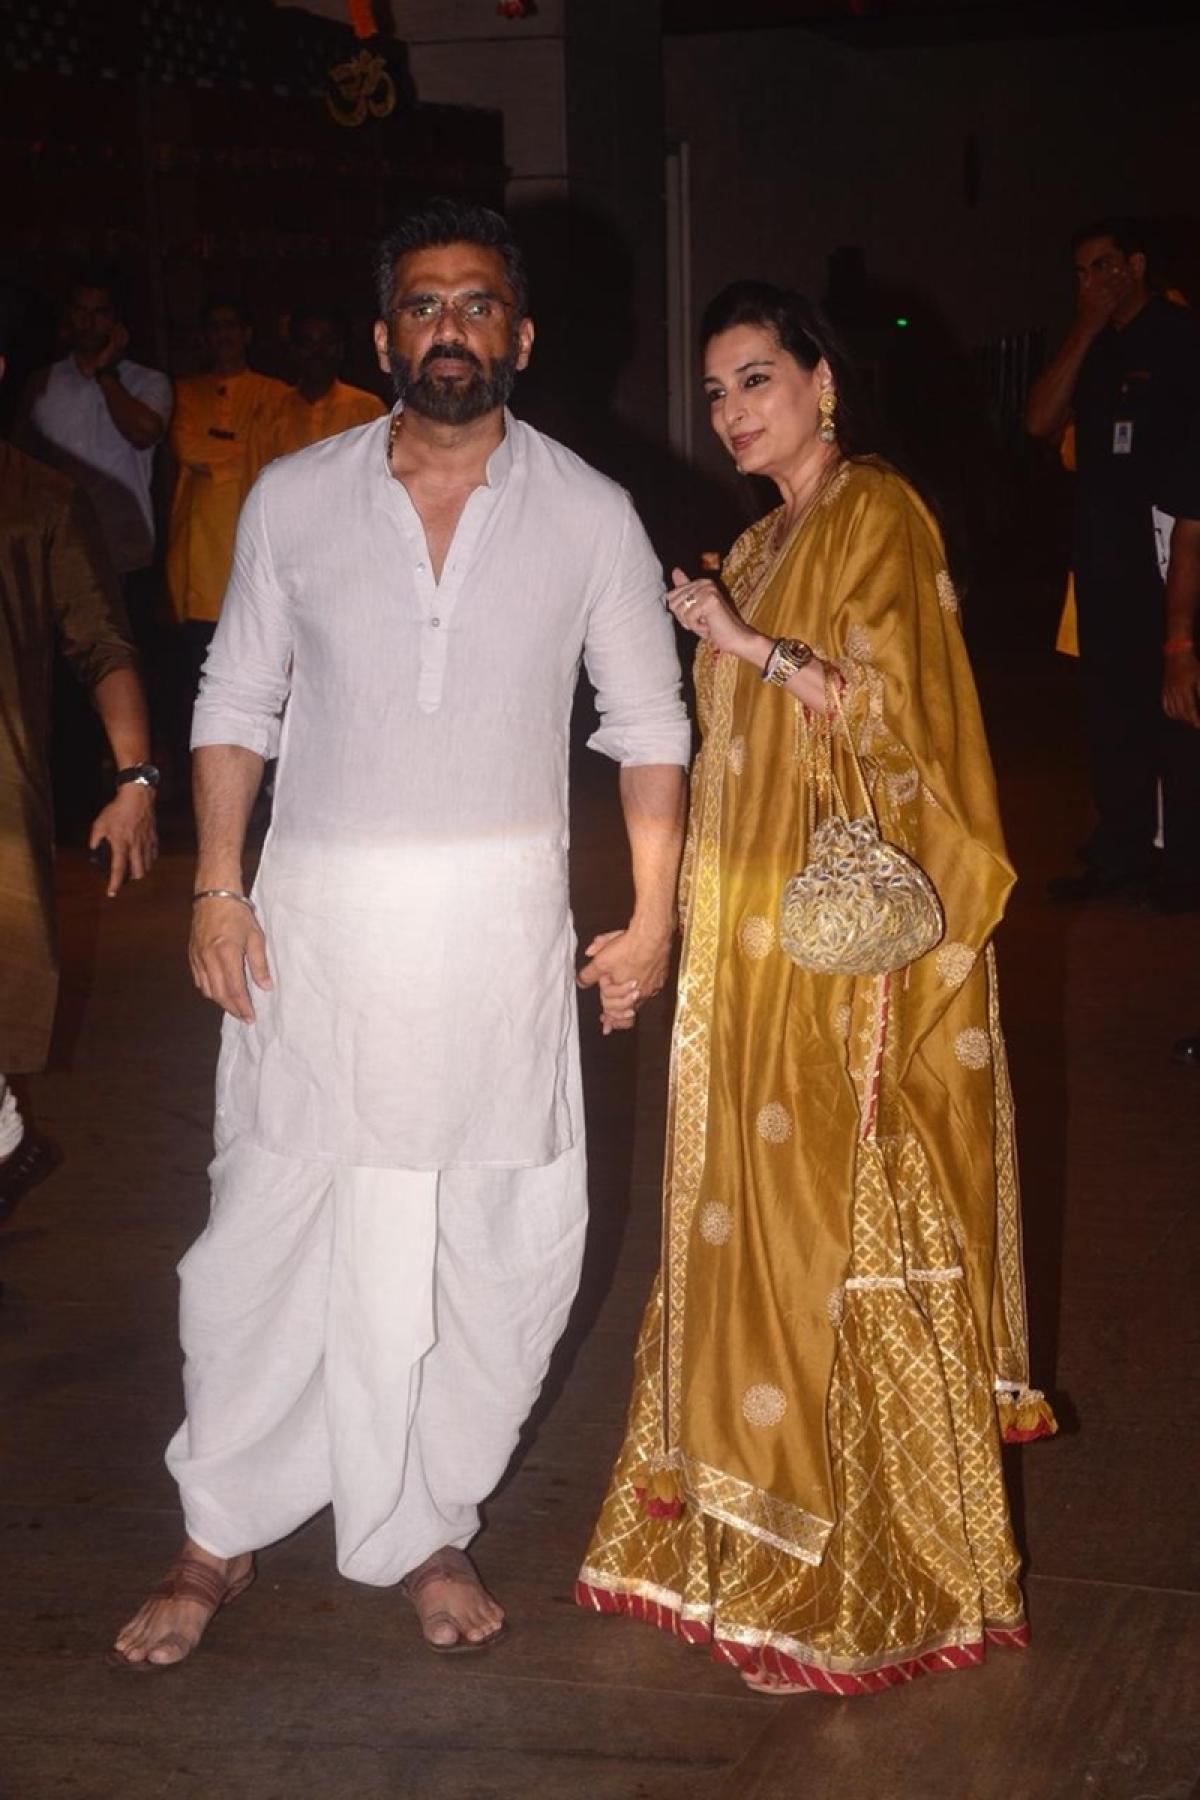 Suniel Shetty and his wife Mana Shetty at Mukesh Ambani's house. Photo By: Viral Bhayani